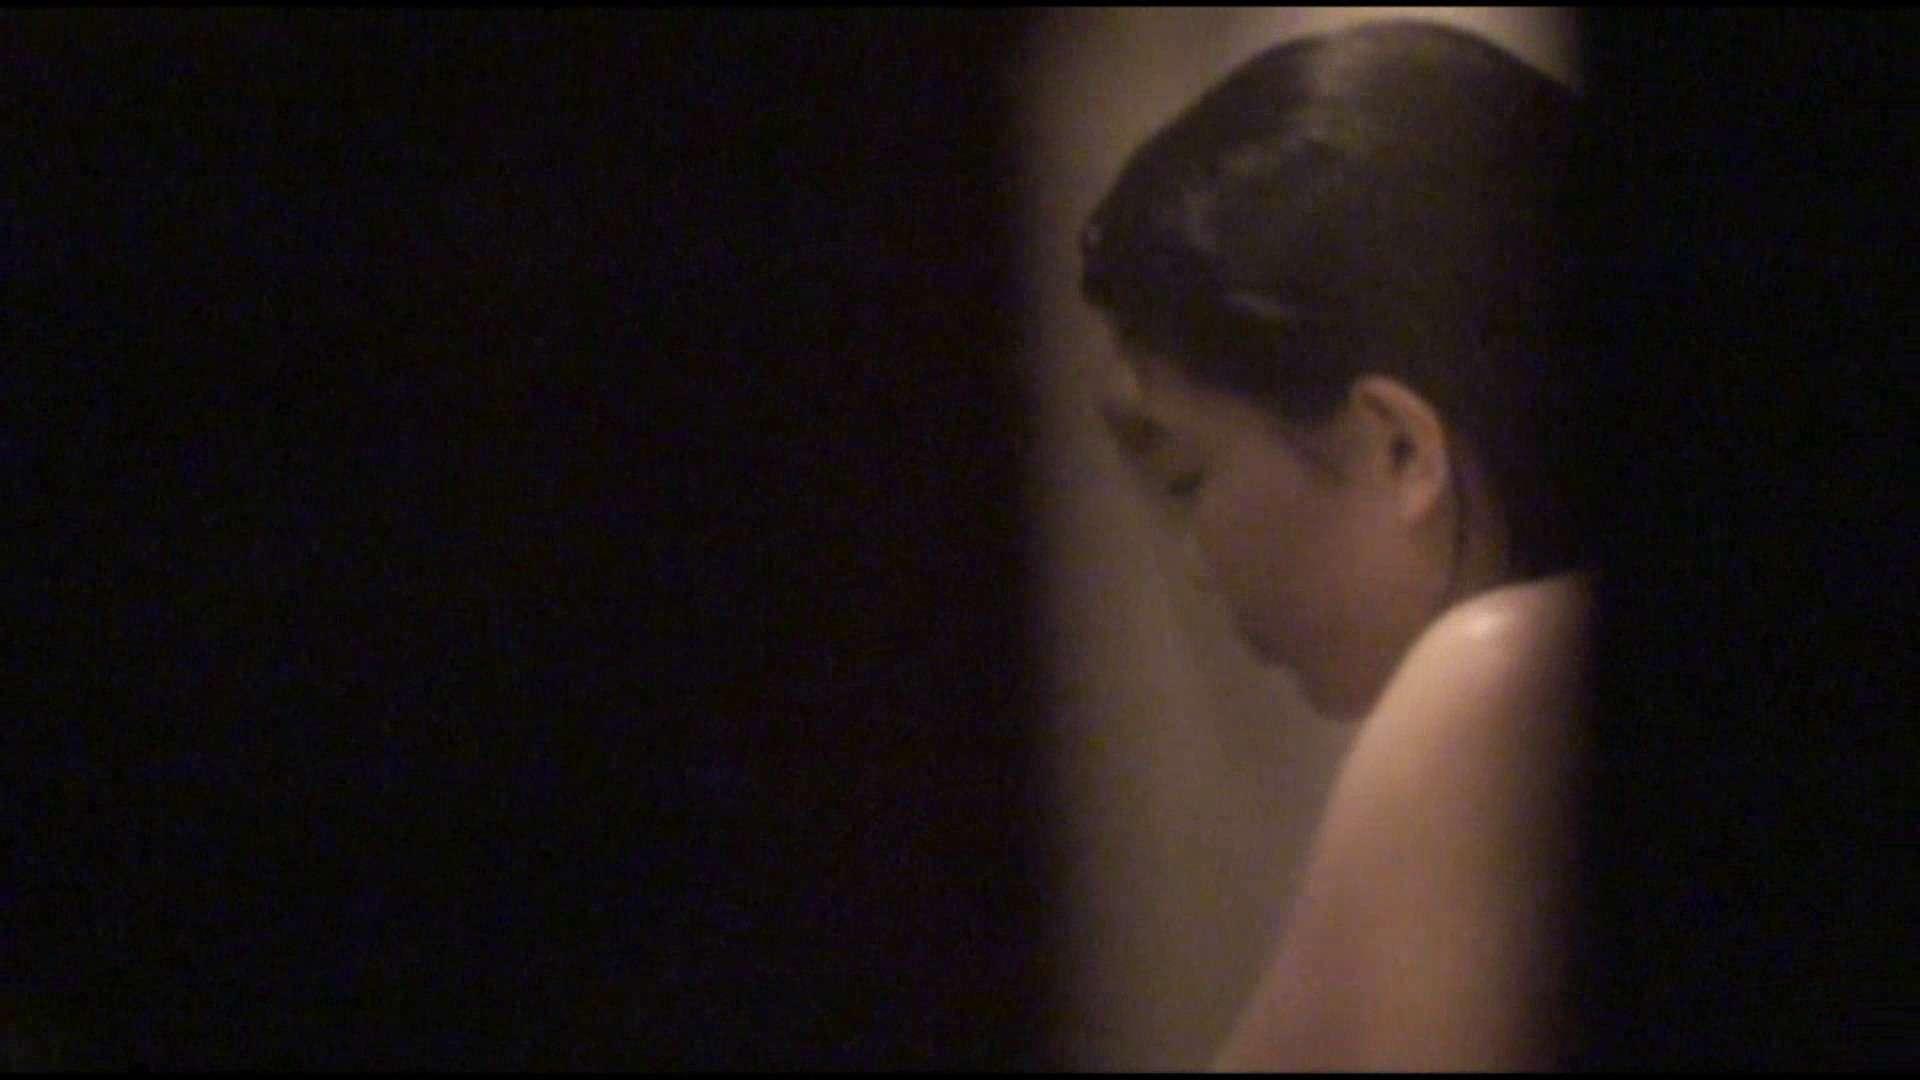 vol.05最高の極上美人!可愛い彼女の裸体をどうぞ!風呂上り鏡チェックも必見! 美人  99PIX 57